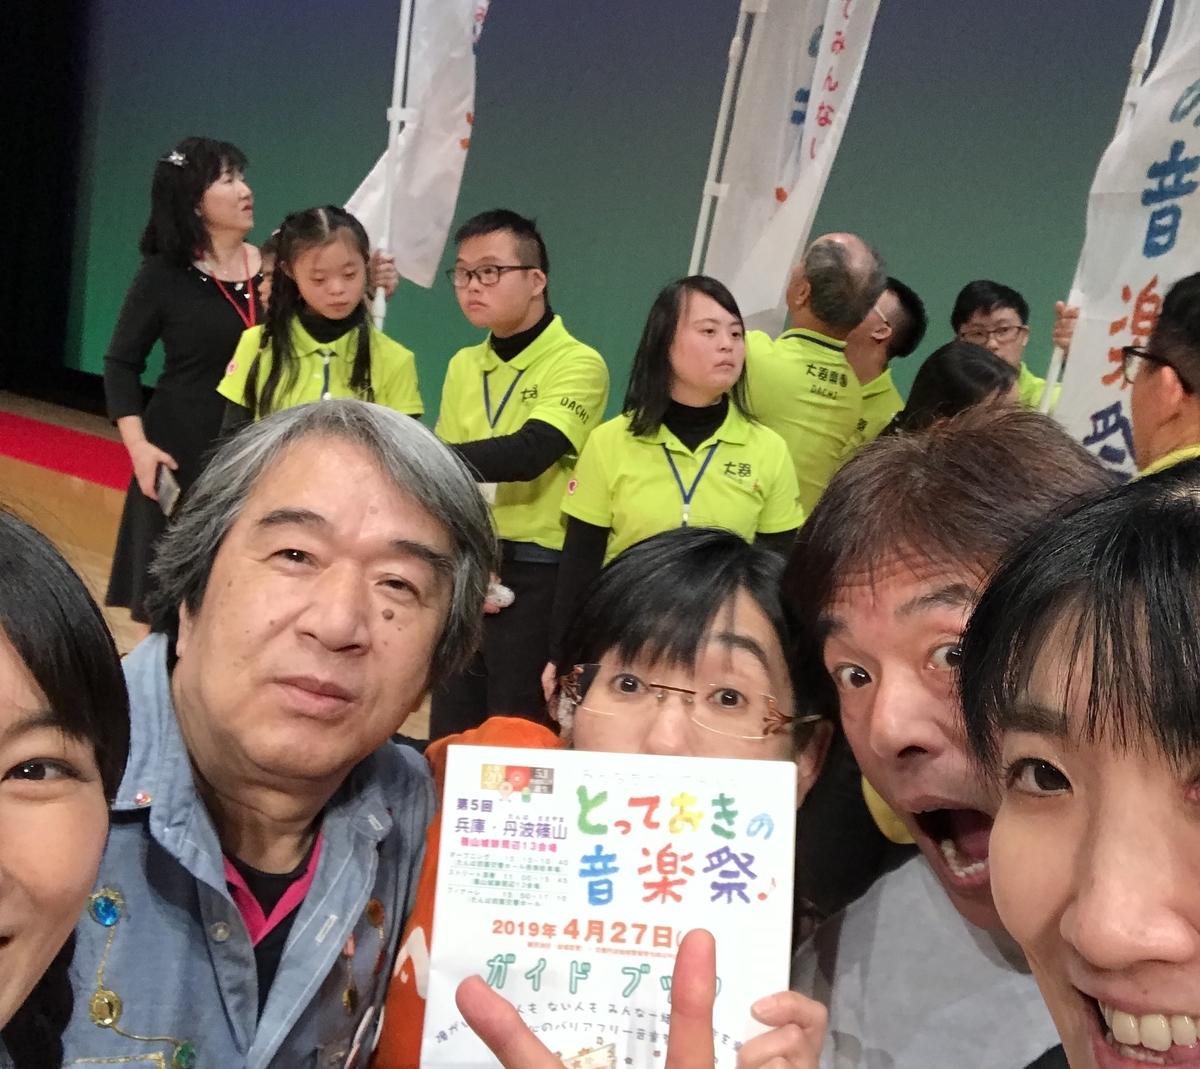 f:id:KizunaKiraKira:20190606065014j:plain